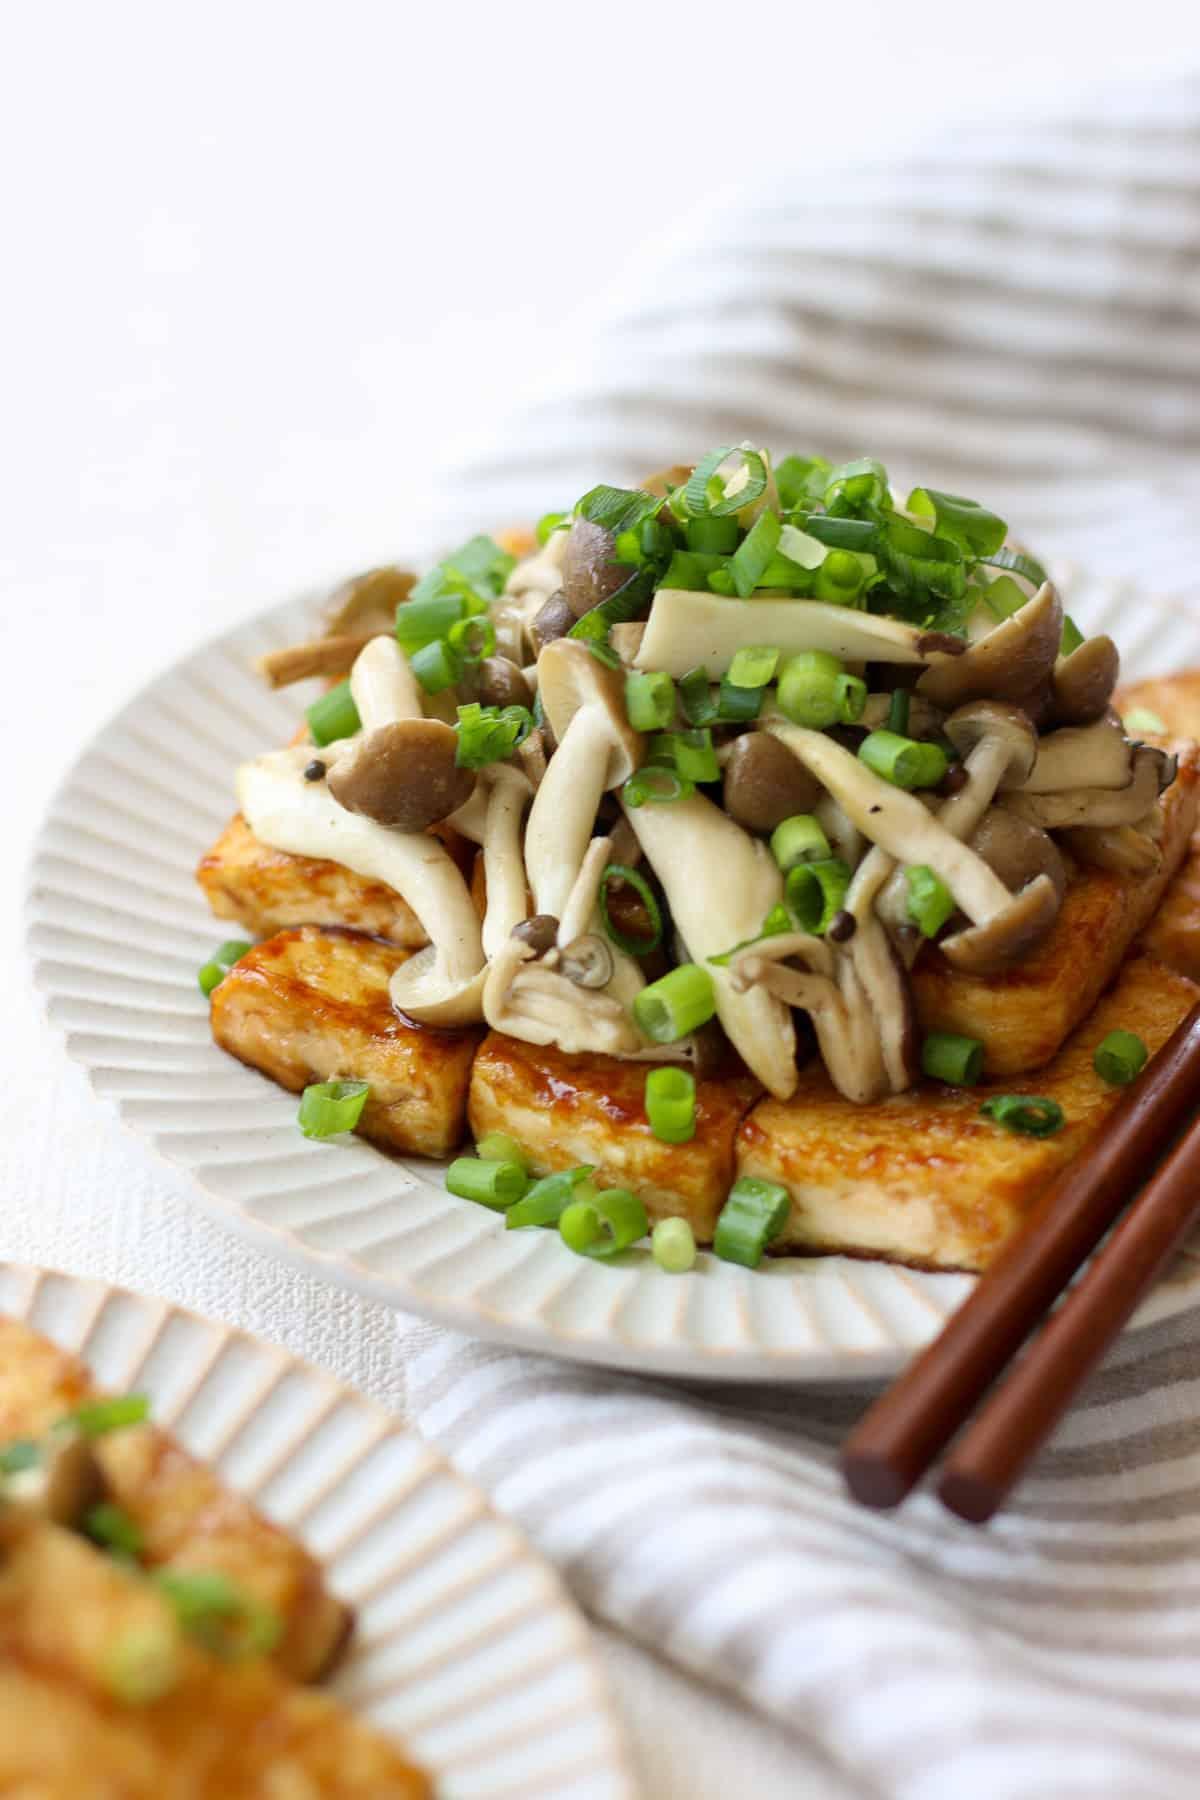 Teriyaki tofu and mushrooms on a plate with chopsticks